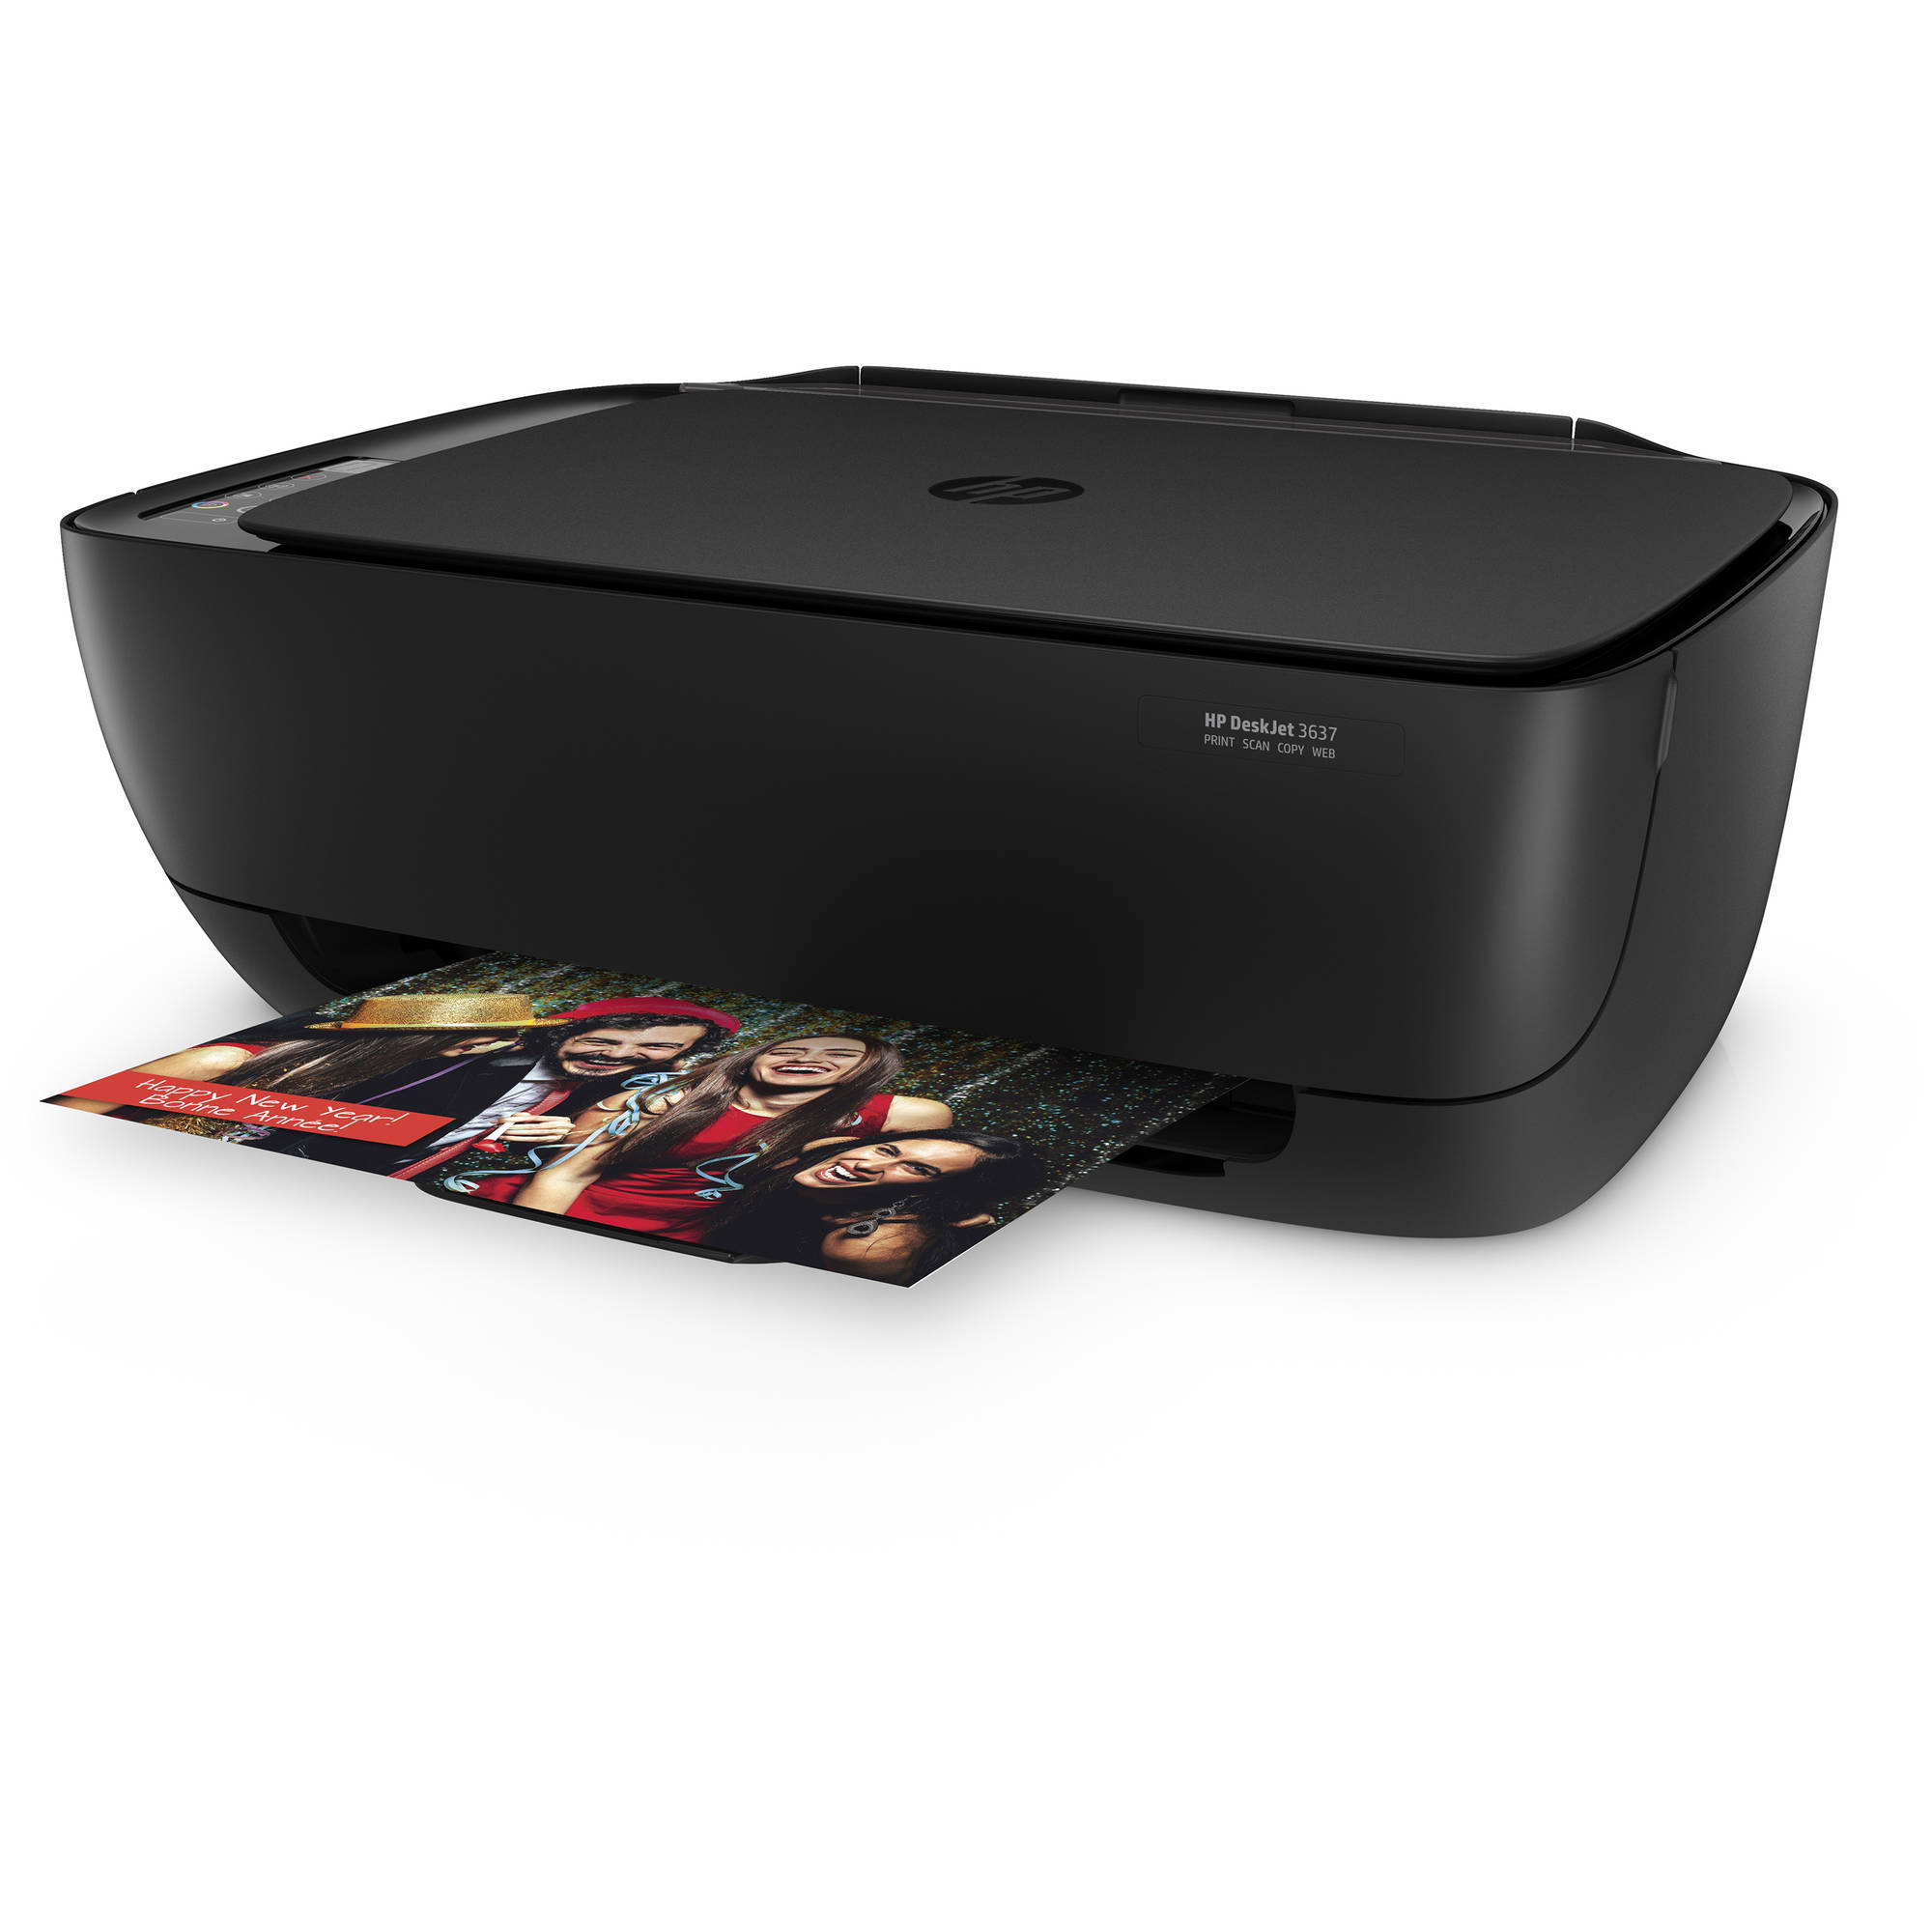 HP DeskJet 3637 All-in-One Inkjet Printer